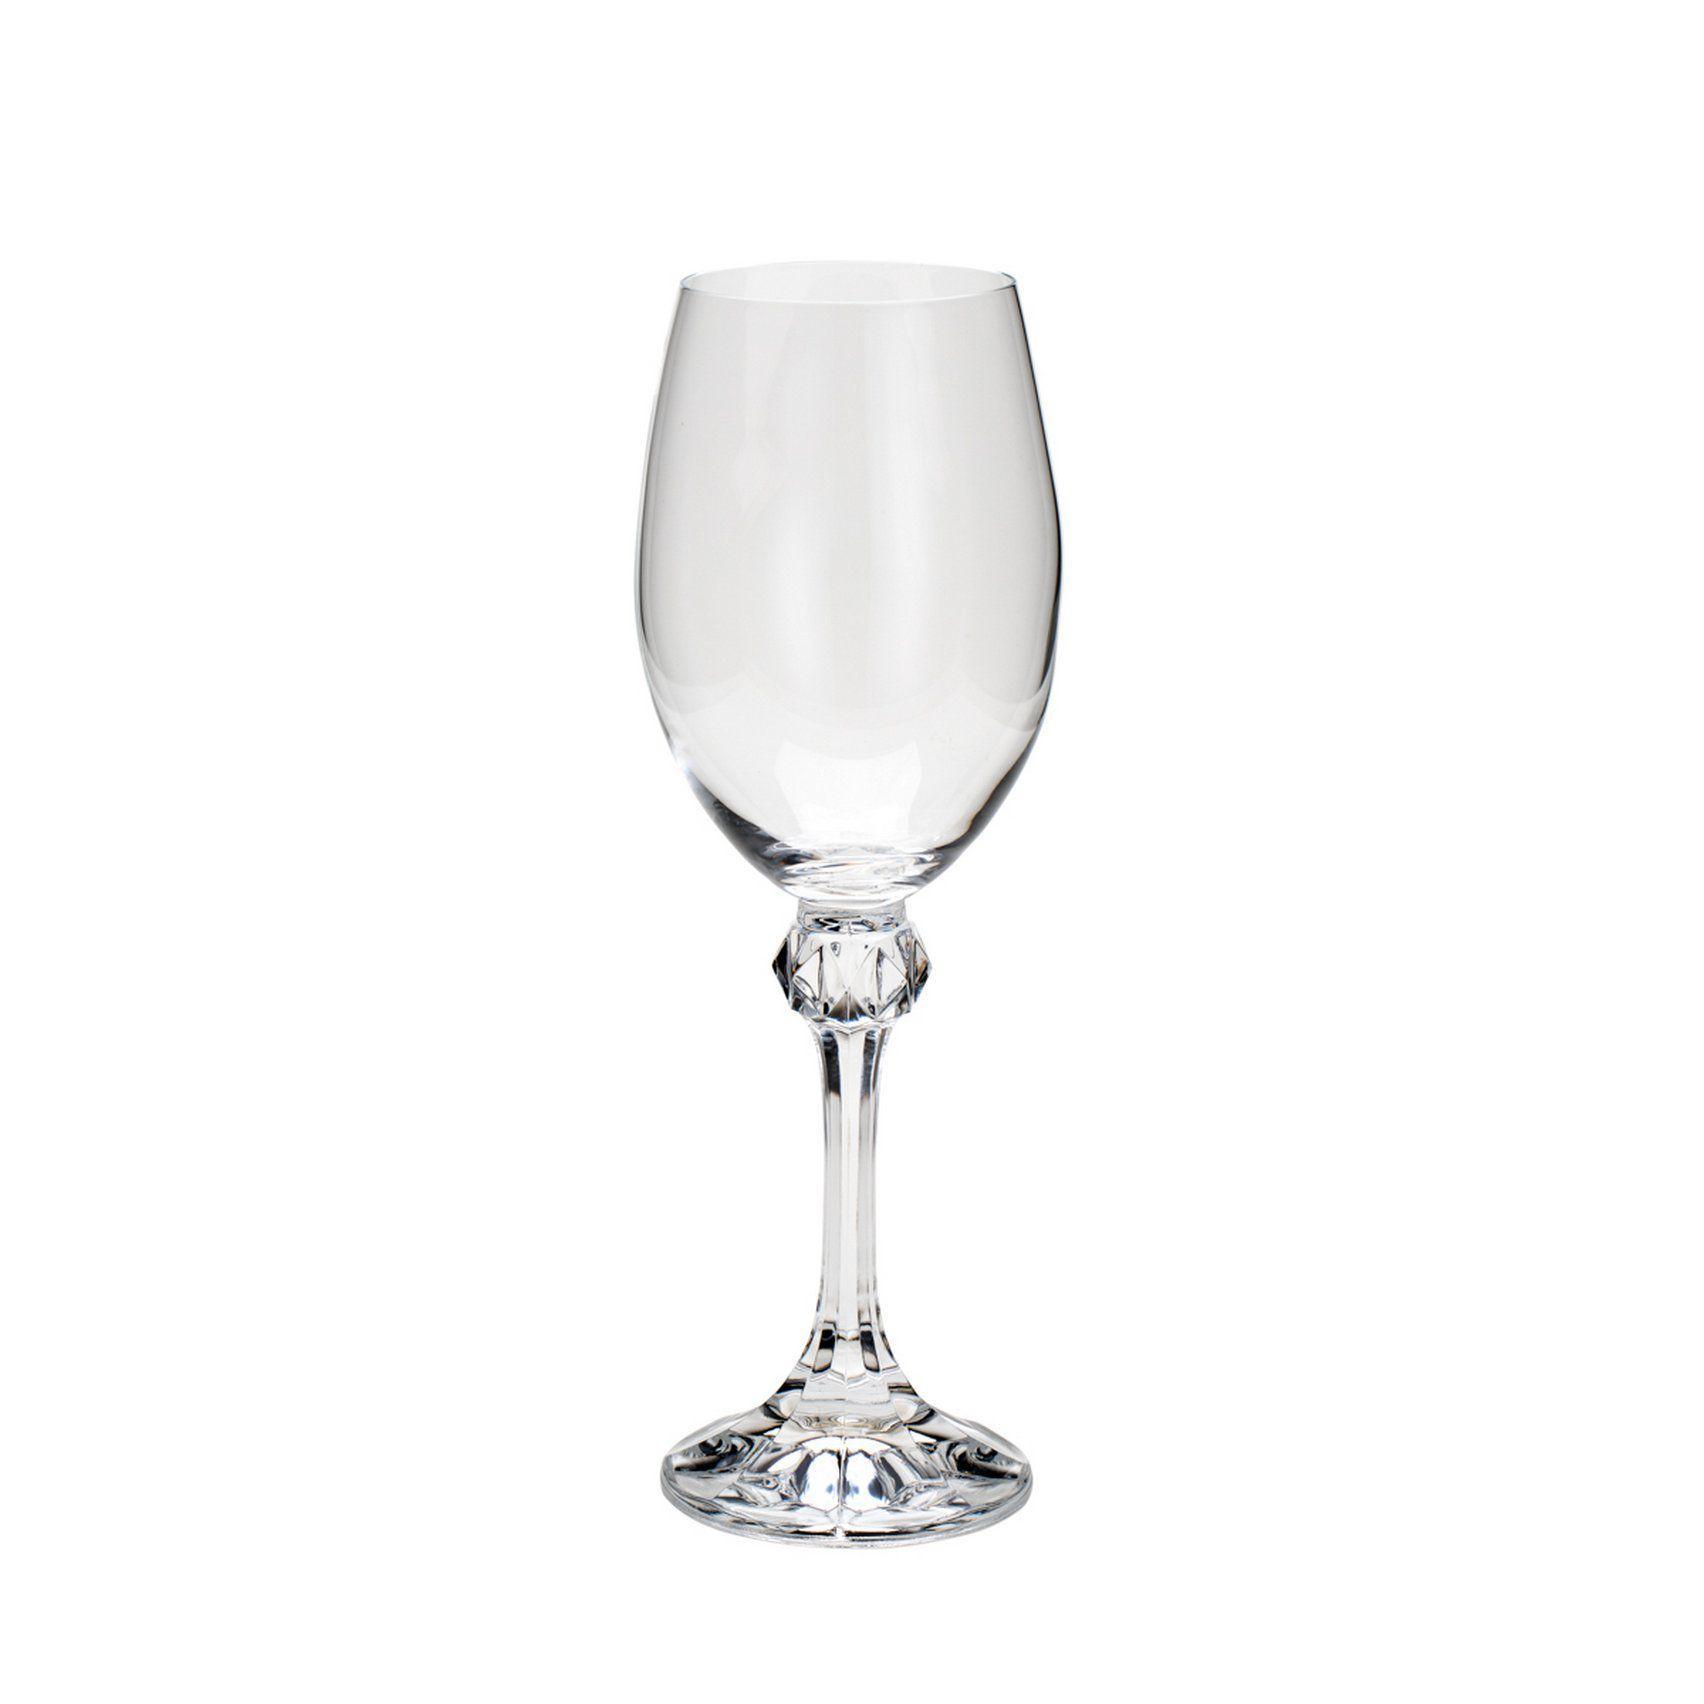 Cj 6 Taças Vinho Branco Cristal Bohemia Elisa 250ml - Rojemac